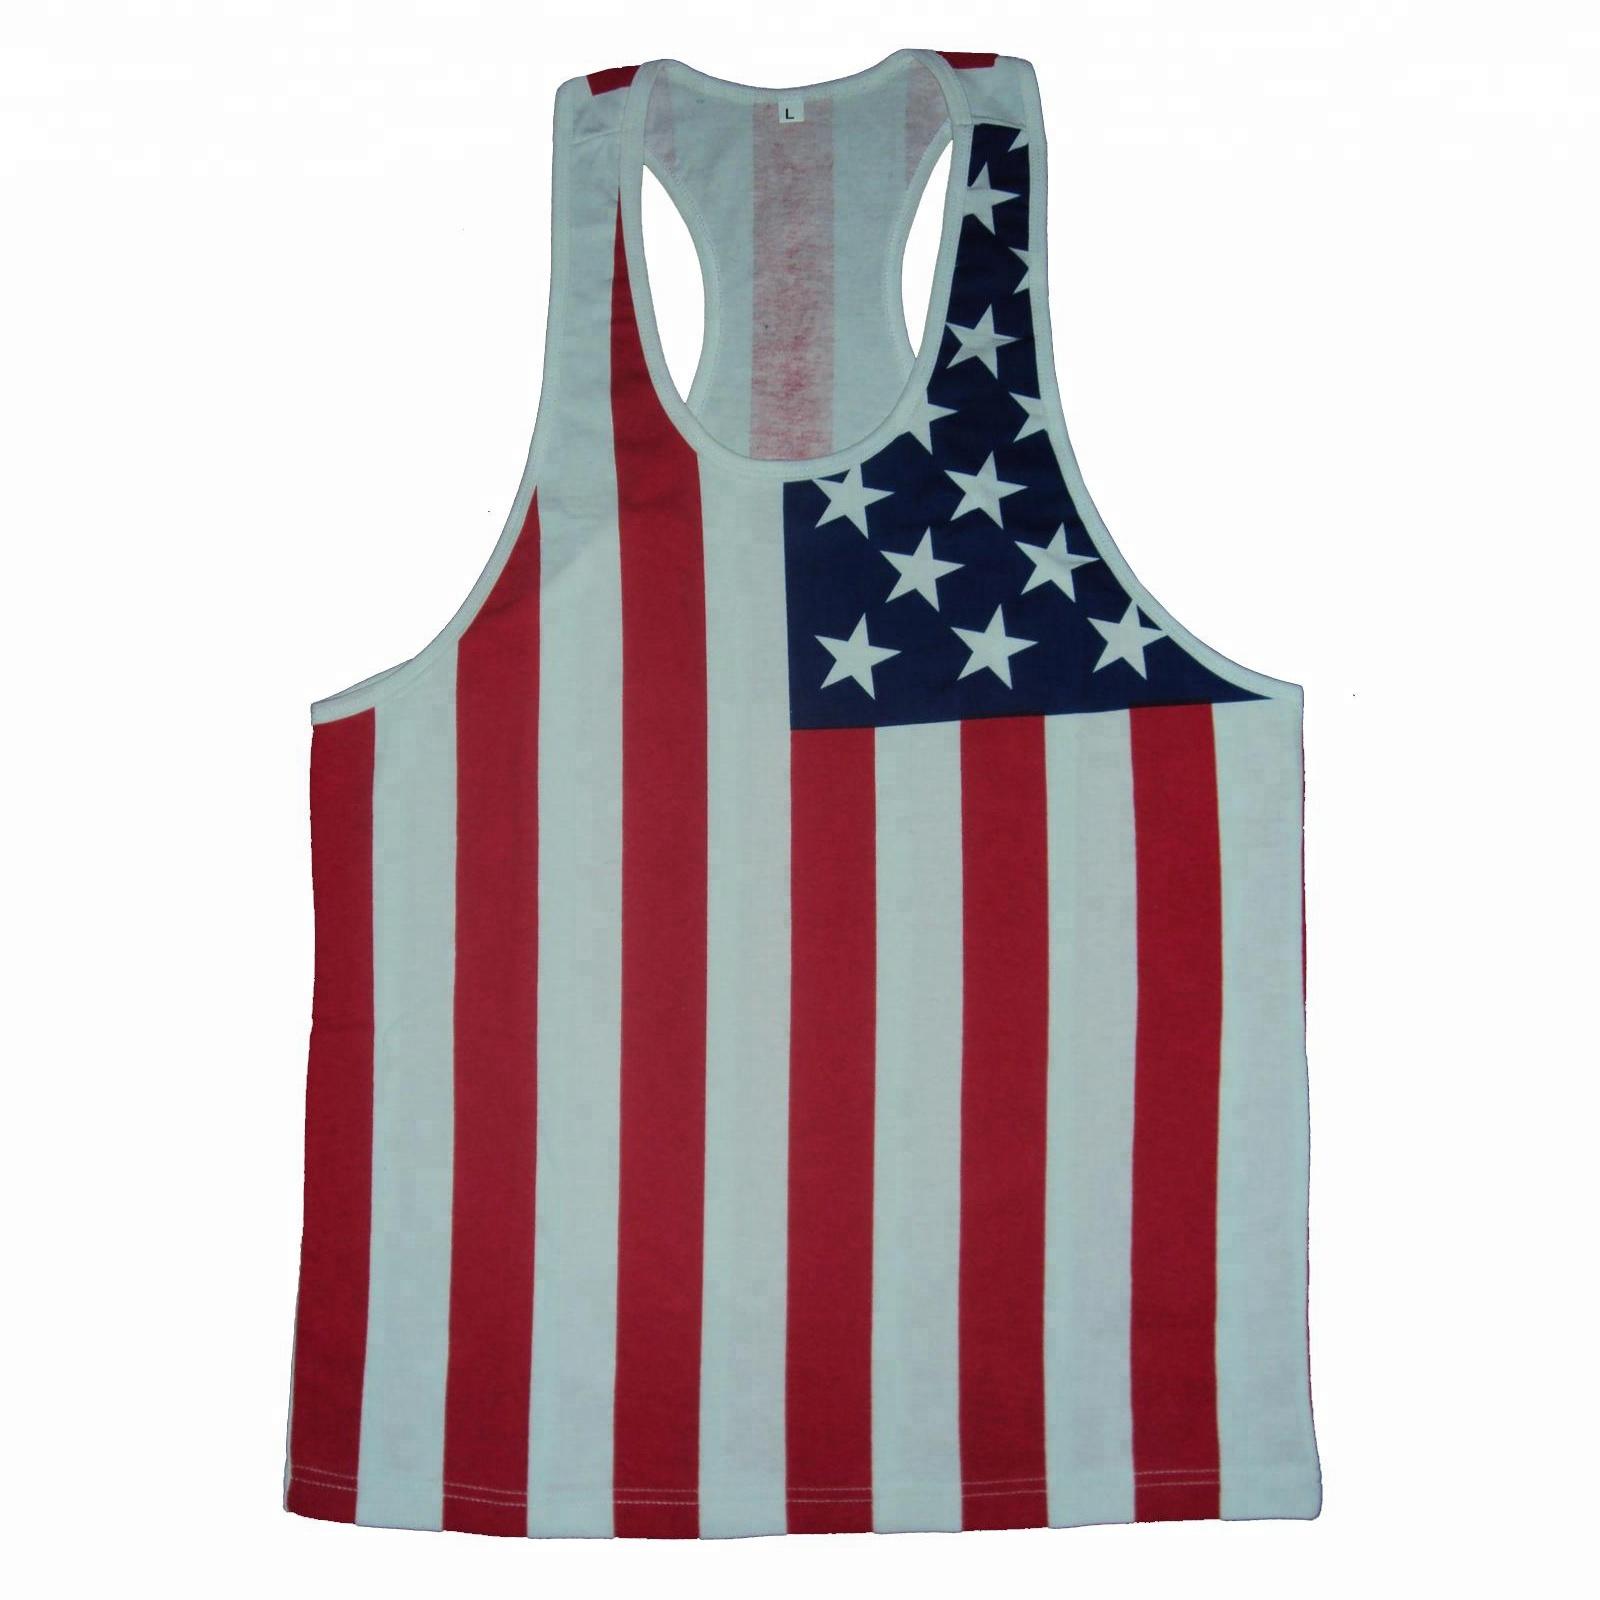 Singlet On Usa Stringer Buy Product Top Men stringer Gym American Vest Singlet mens Singlets Flag Tank EHDe9W2IYb